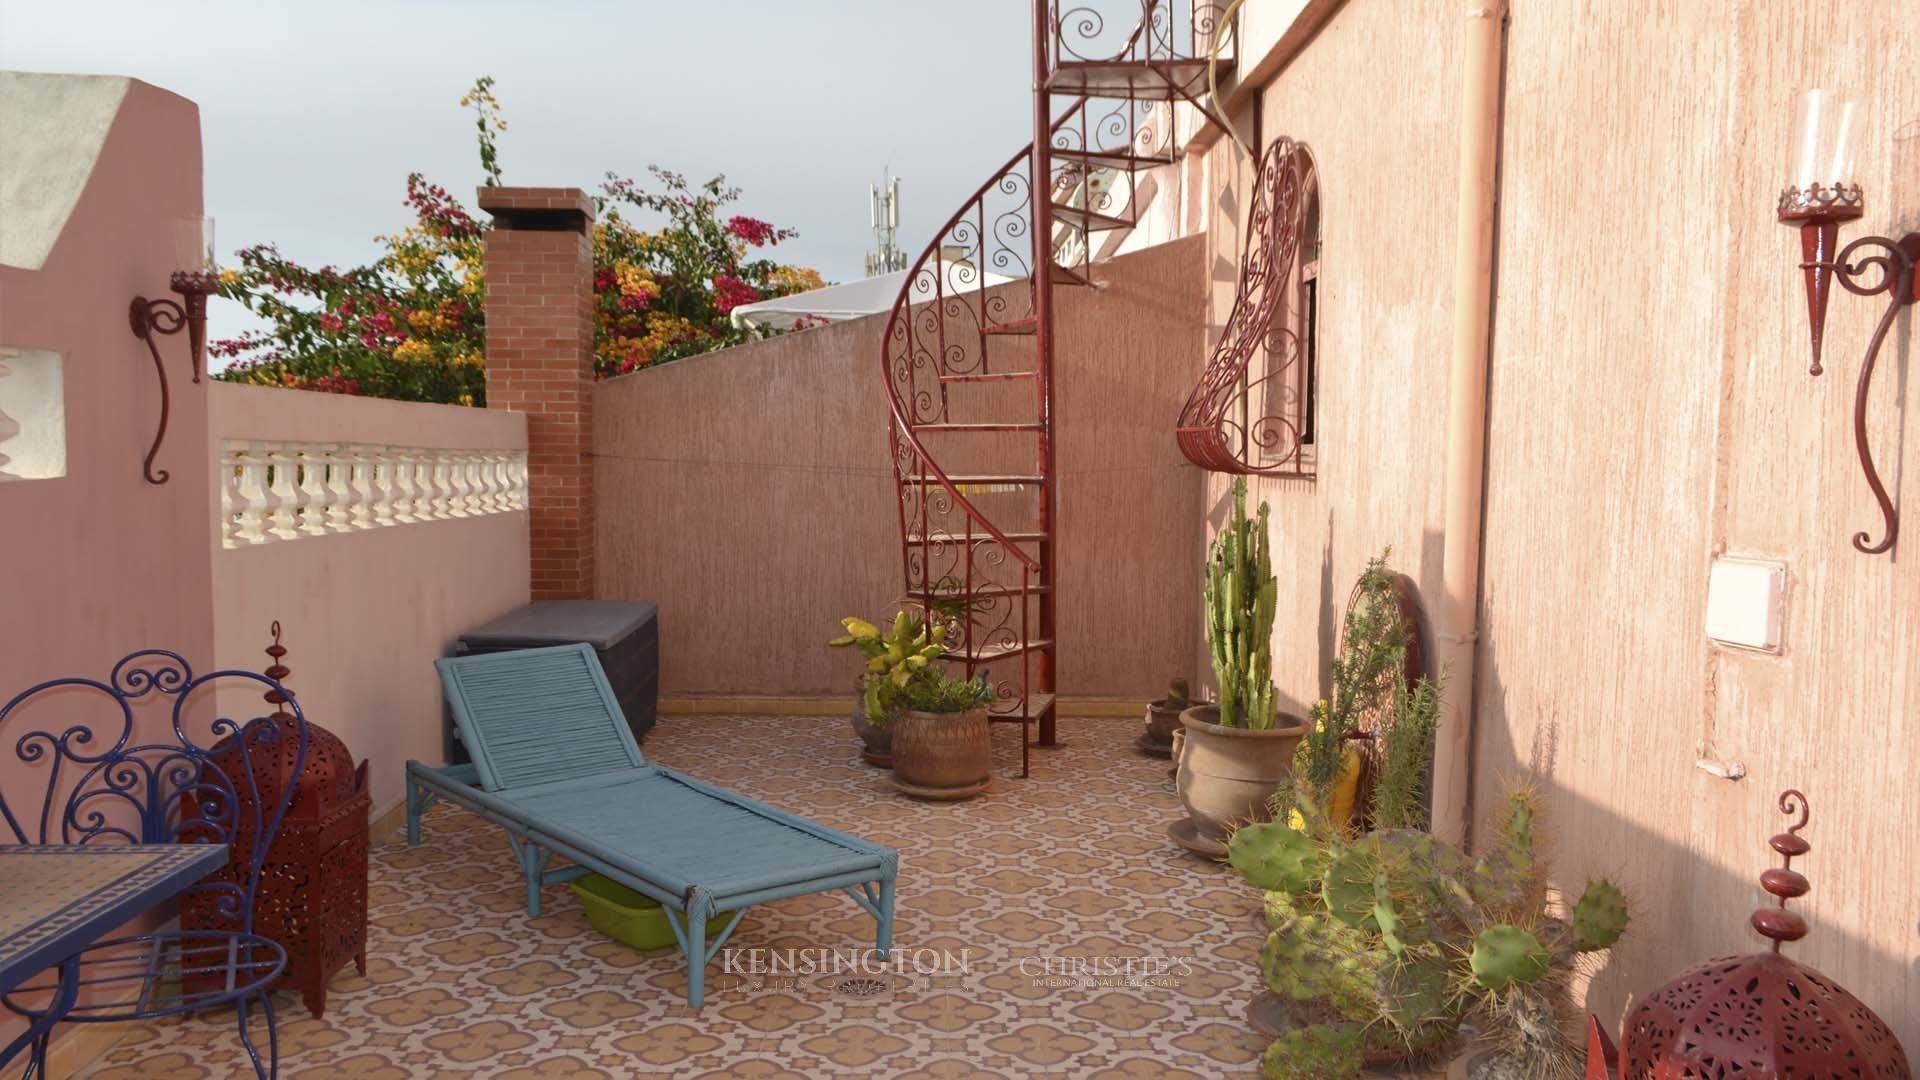 KPPM01301: Villa La Renaissance Villa de luxe Essaouira Maroc